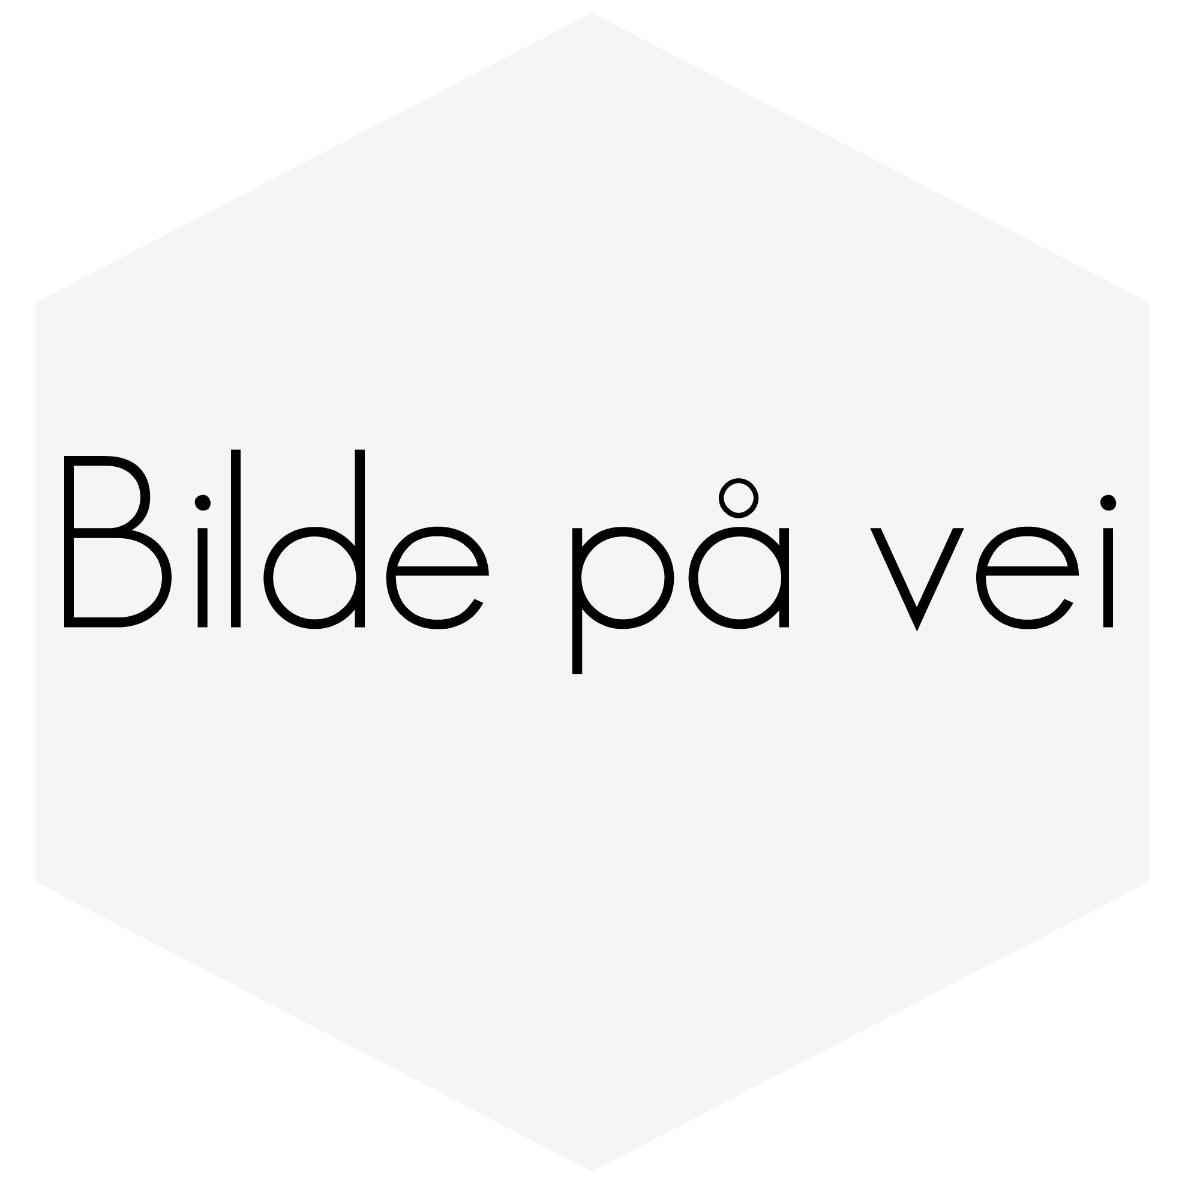 "SILIKONSLANGE RØD REDUSERING 3-4"" (76-102MM)"